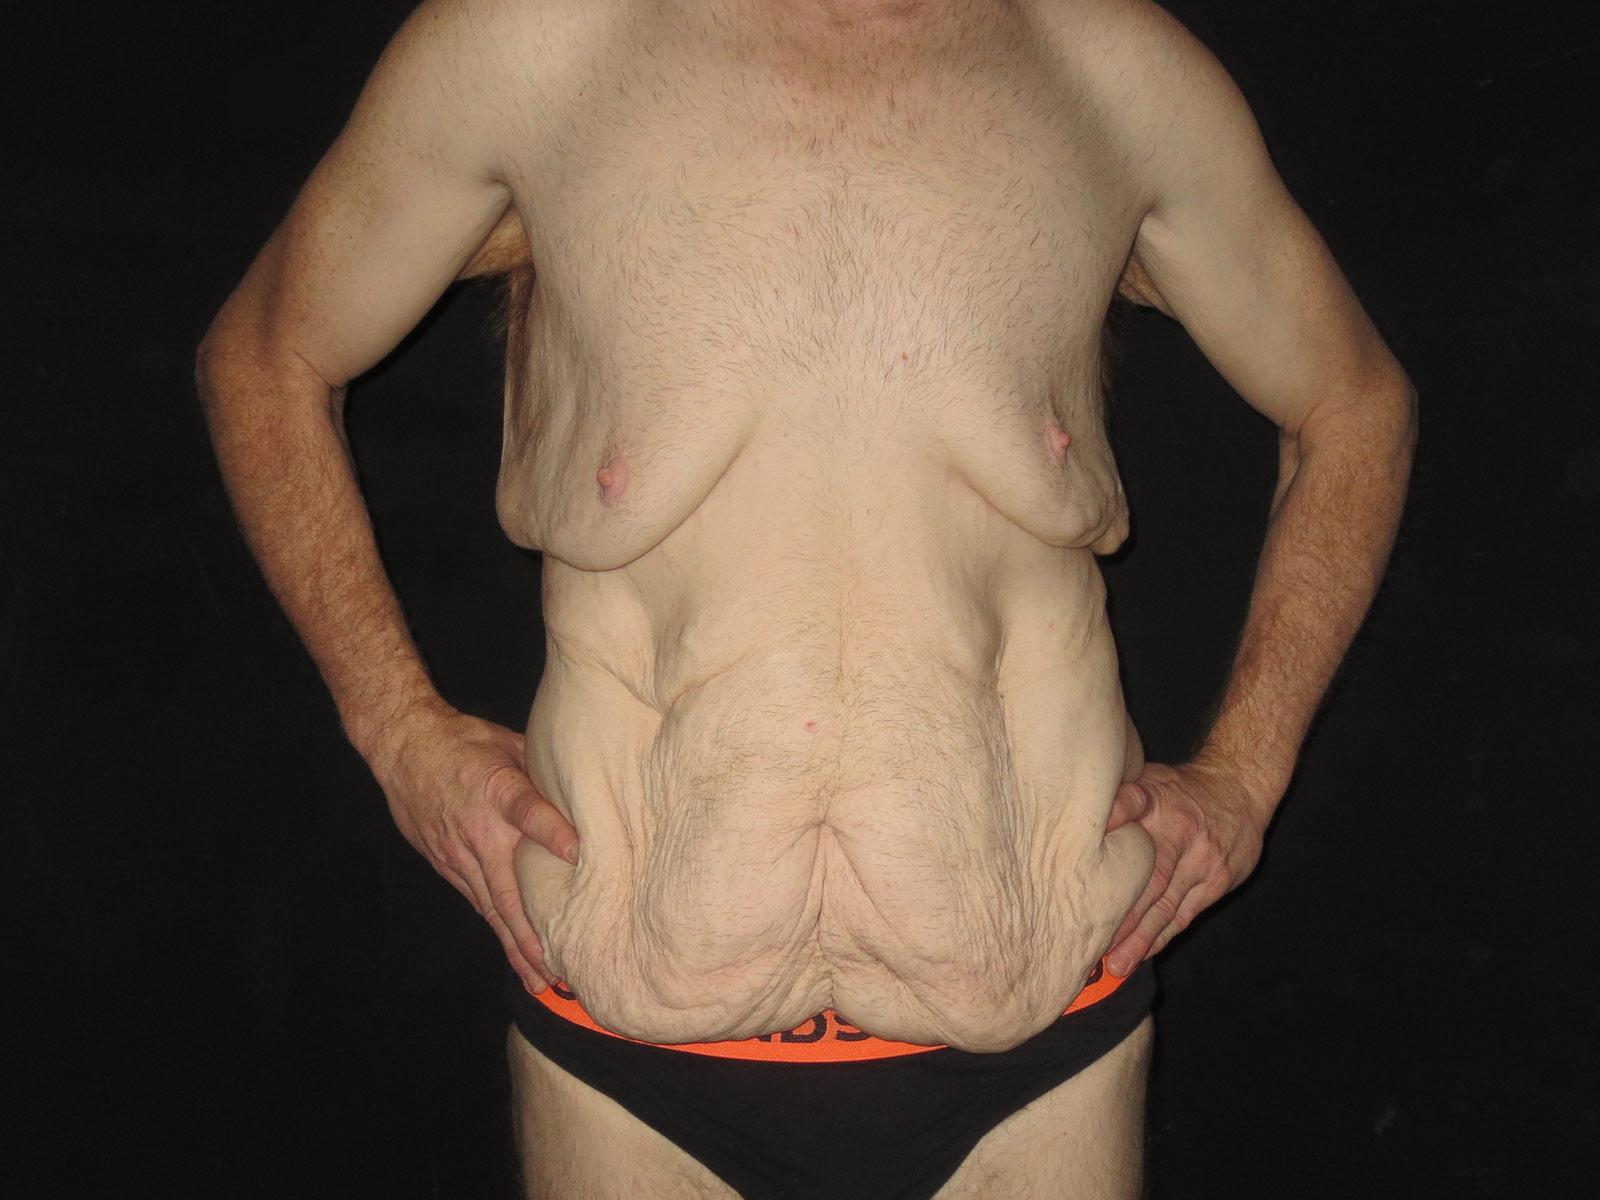 mini liposuction surgery